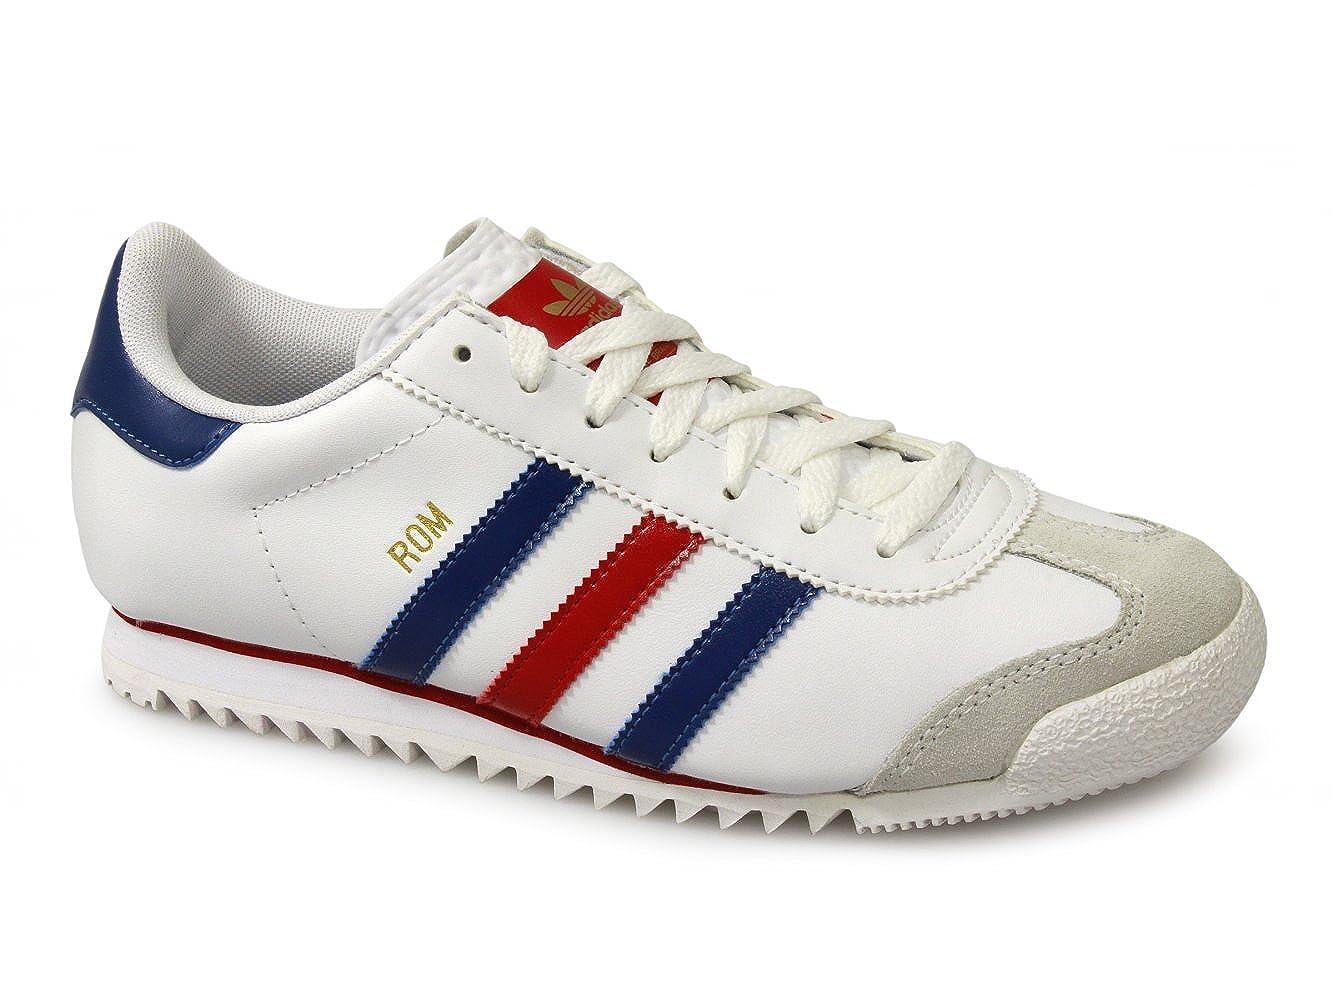 a49101cf7b8fc Adidas Originals ROM Mens Retro Fashion trainers 12 UK: Amazon.co.uk ...